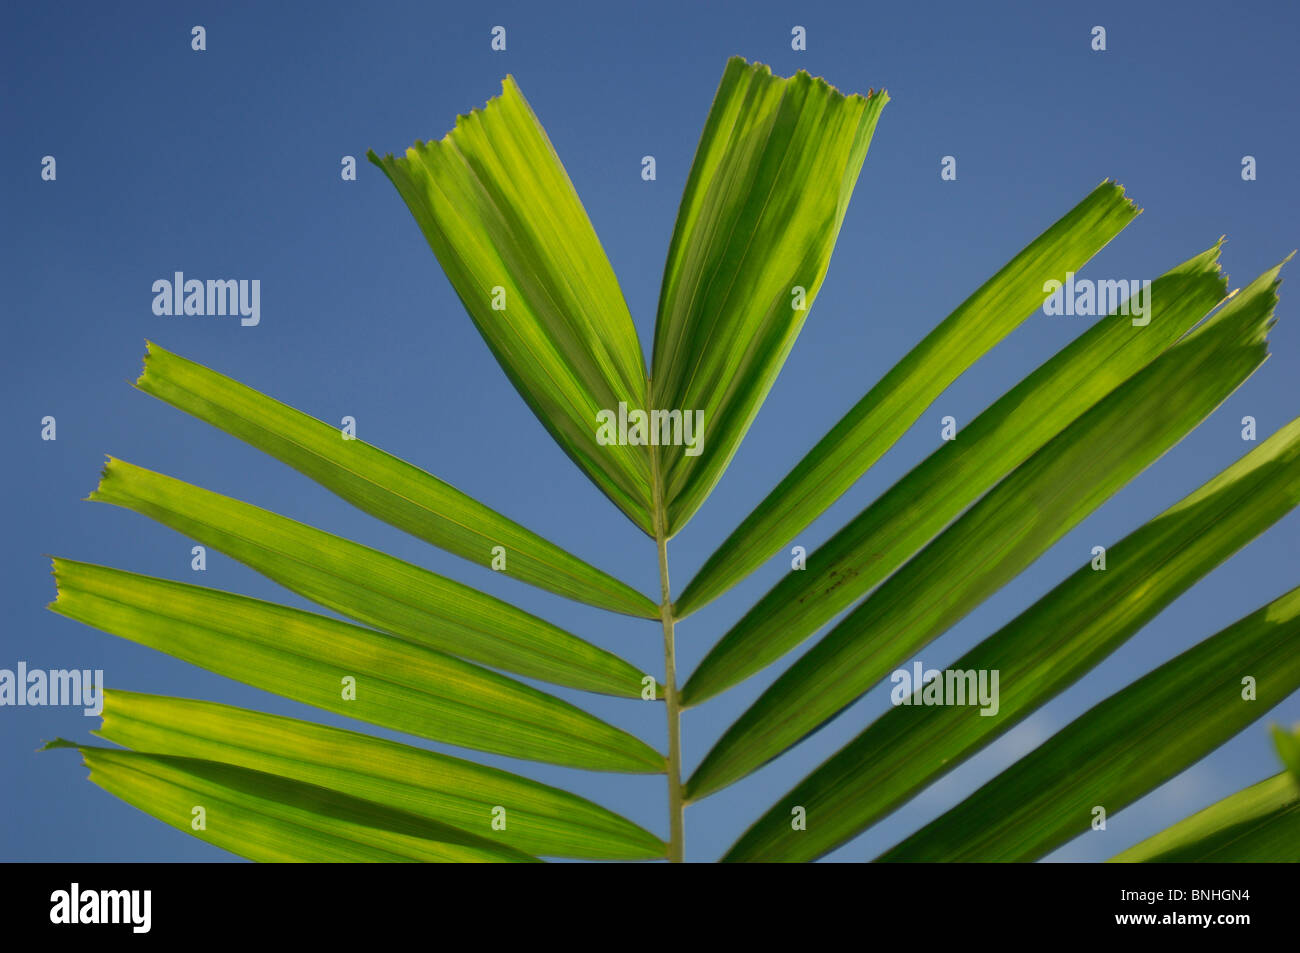 Caribbean Vauxhall Barbados Almond Beach Club & Spa Hotel West Coast Palm Palms Leaves Leaf Leafs Detail Close - Stock Image